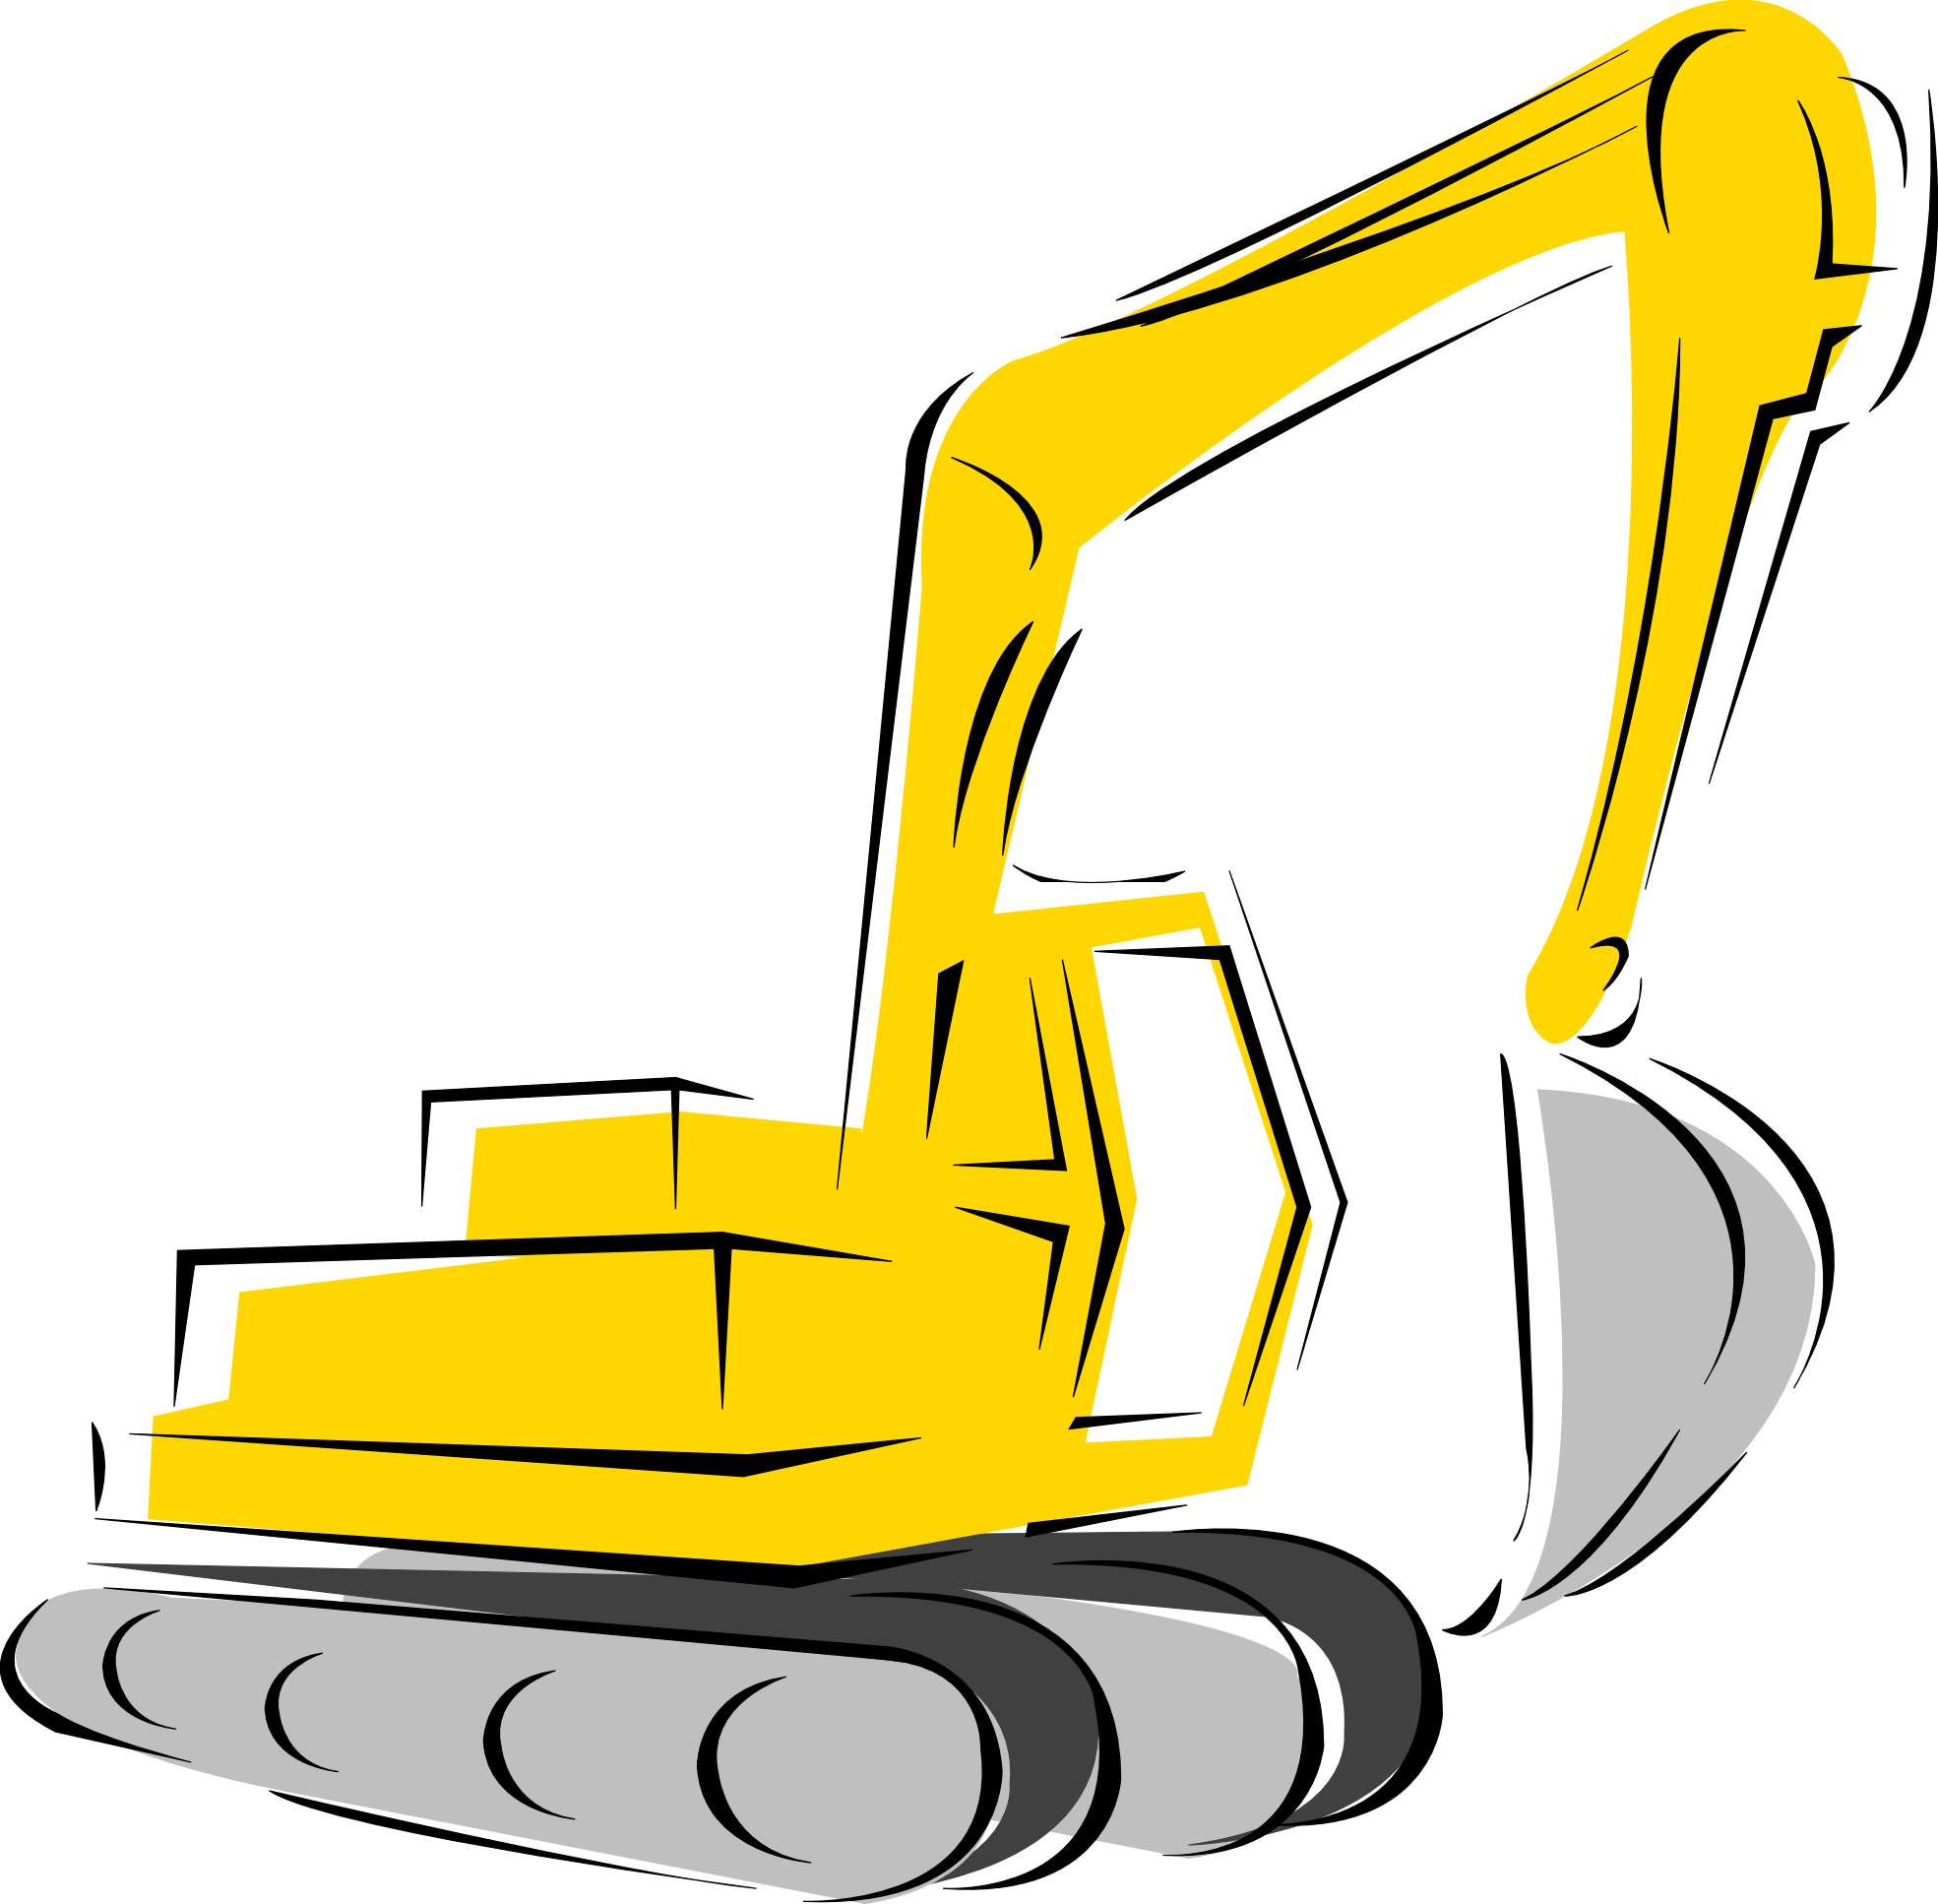 Construction equipment clipart.